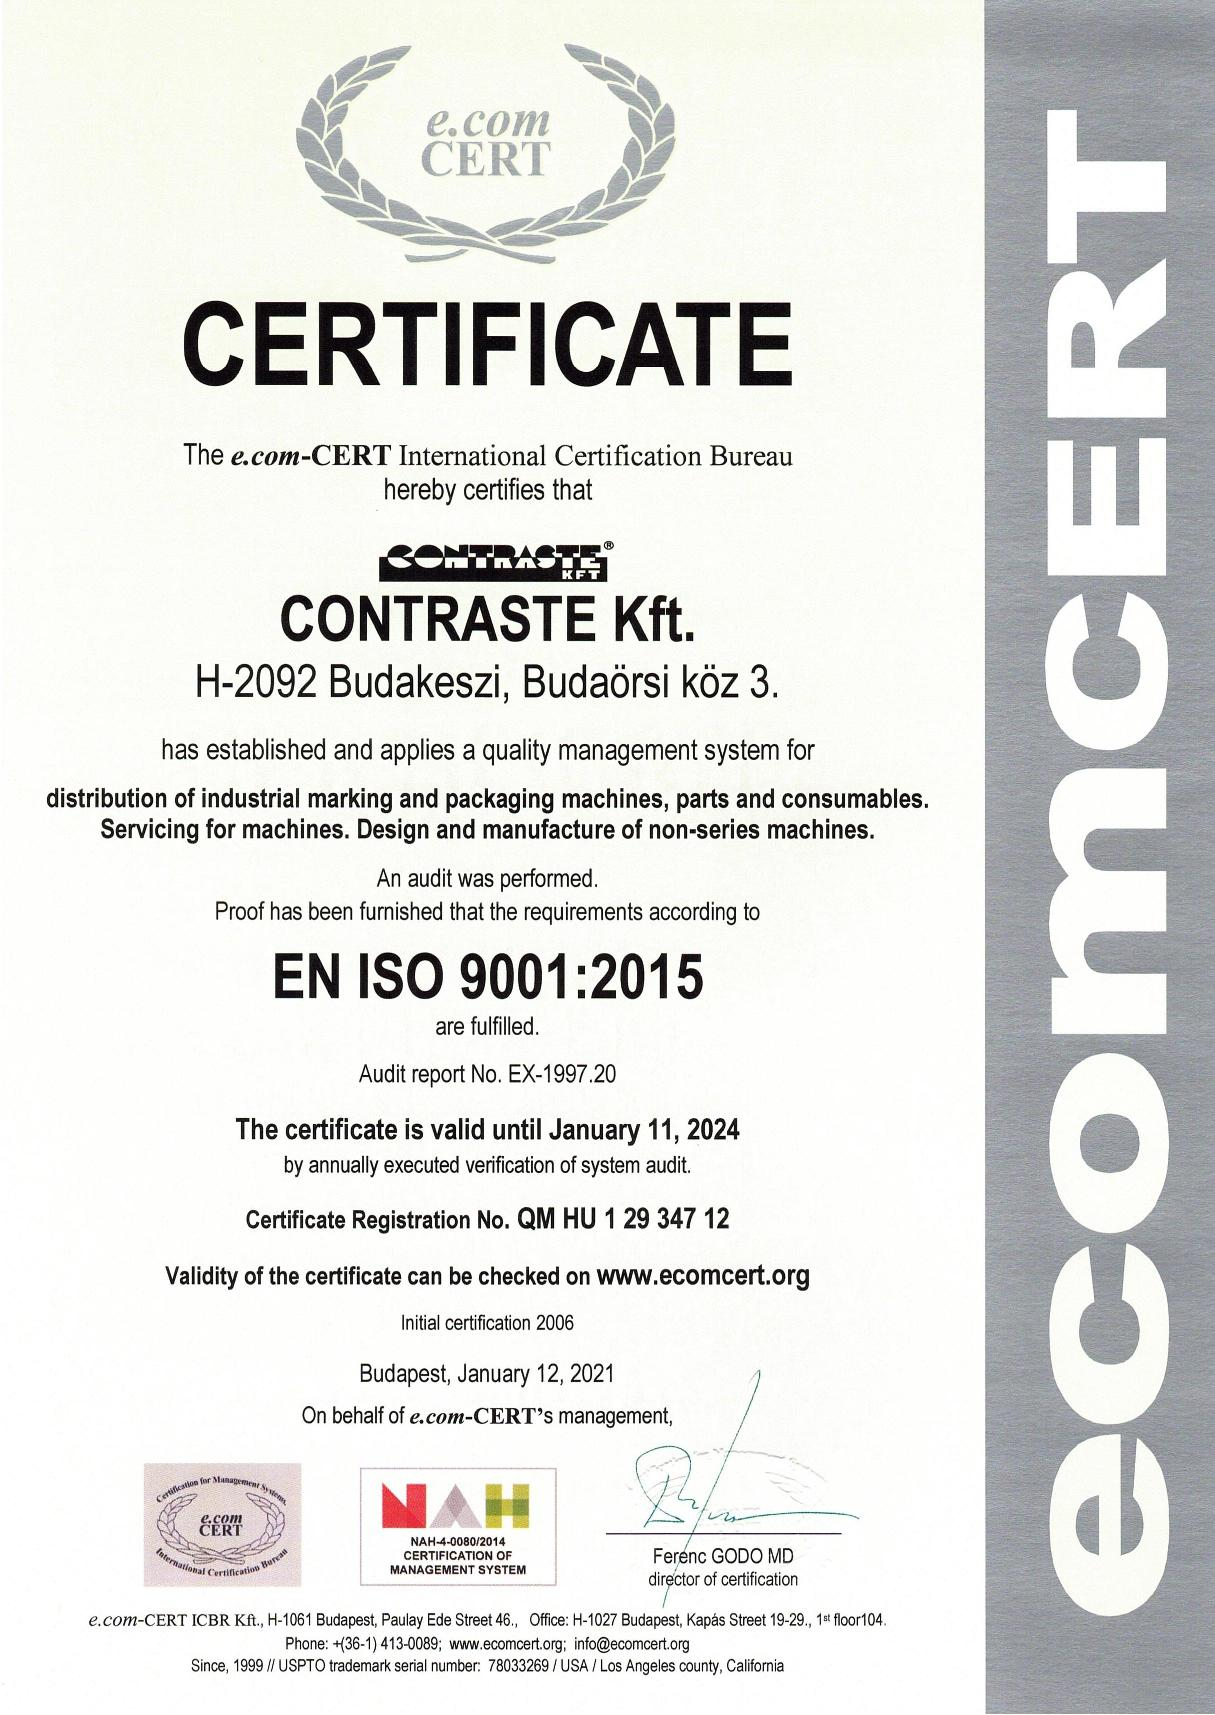 CONTRASTE Kft_EX-1997.20_QMS CERT ENG_2021-page-001